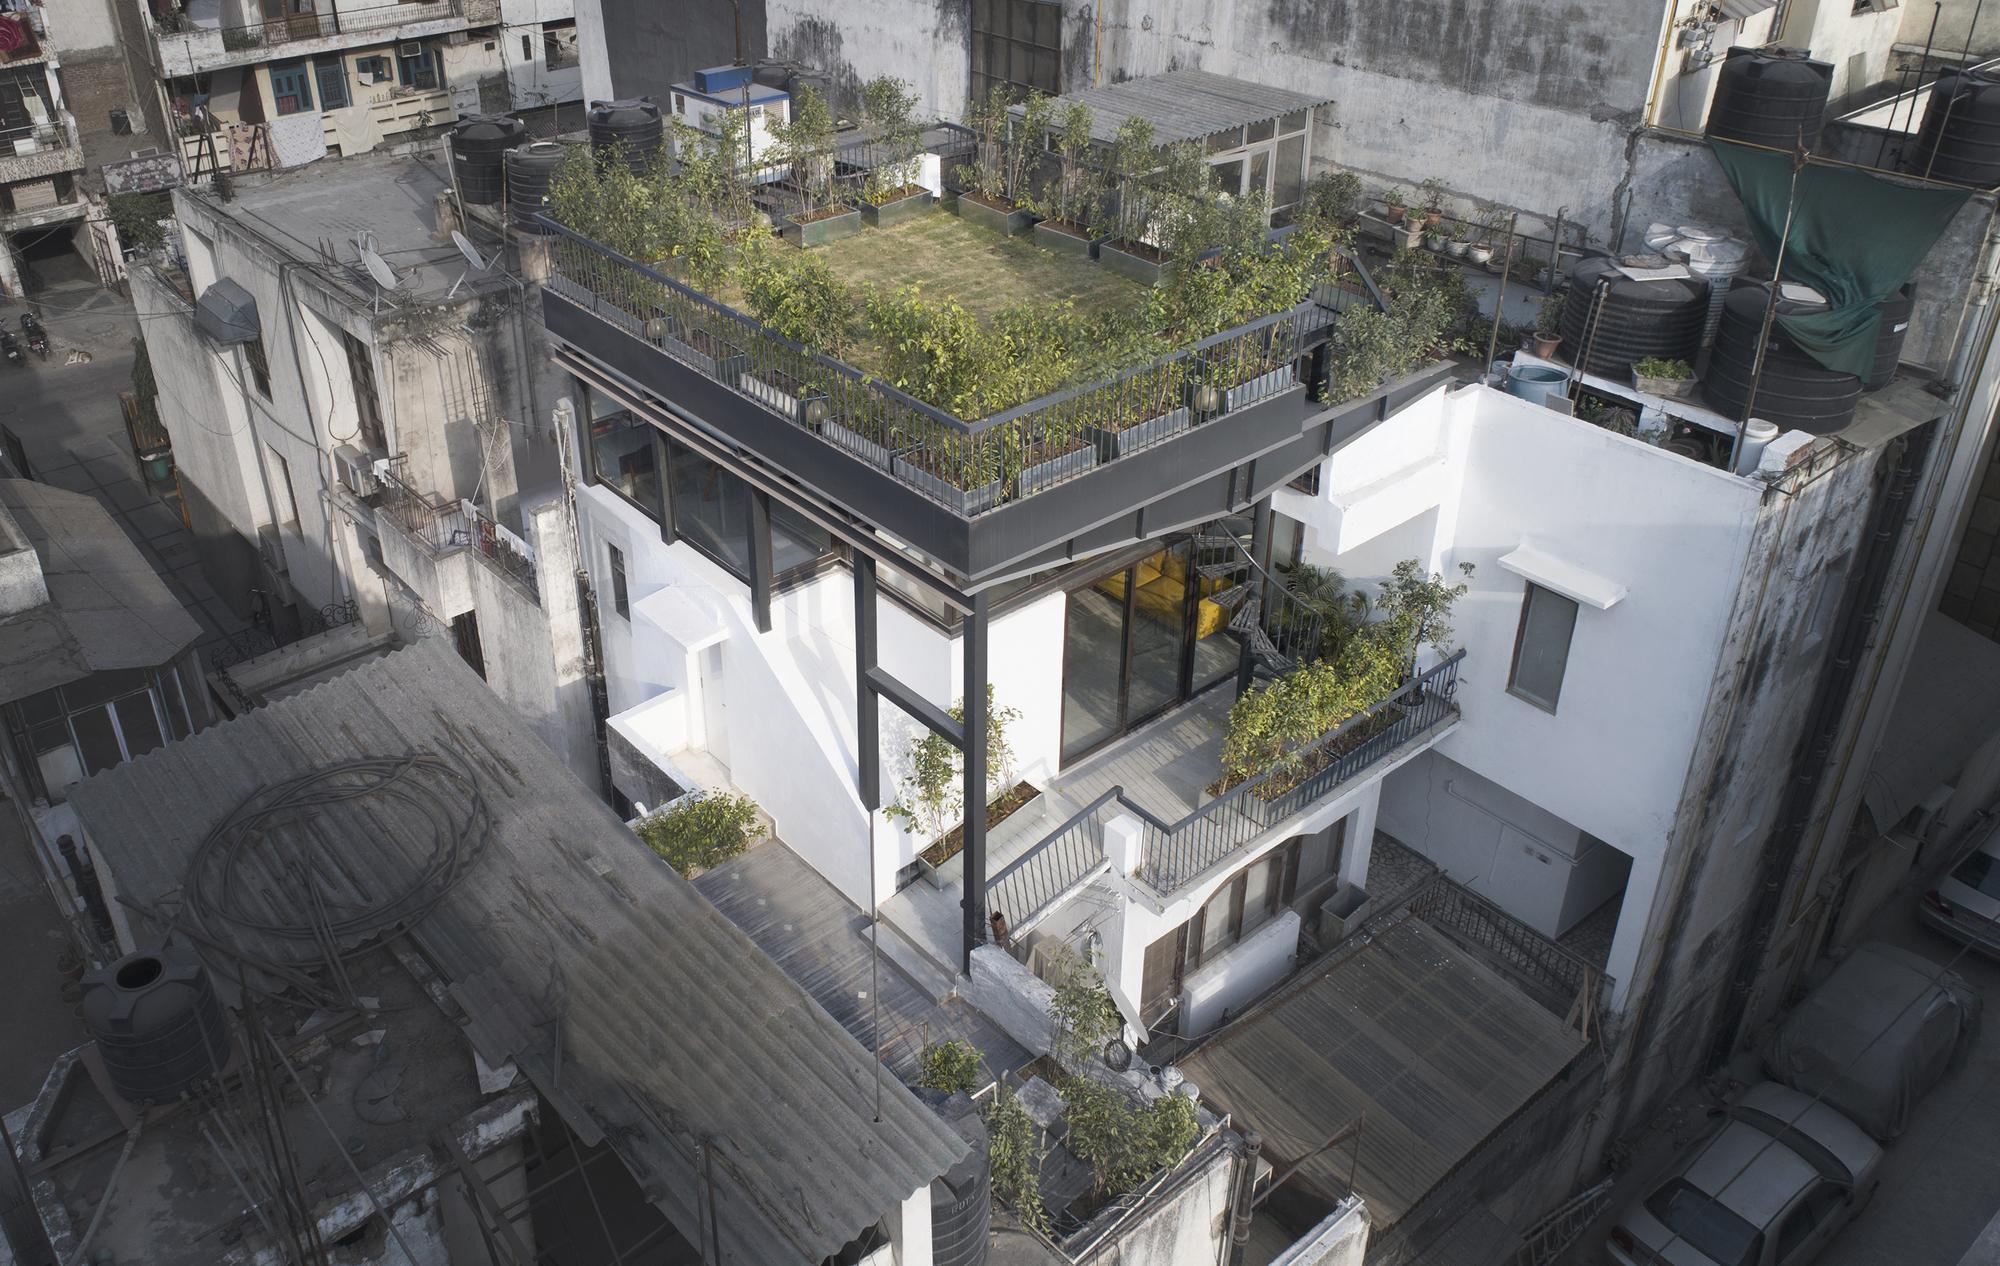 The Garden Roof Parasol / Harsh Vardhan Jain Architect